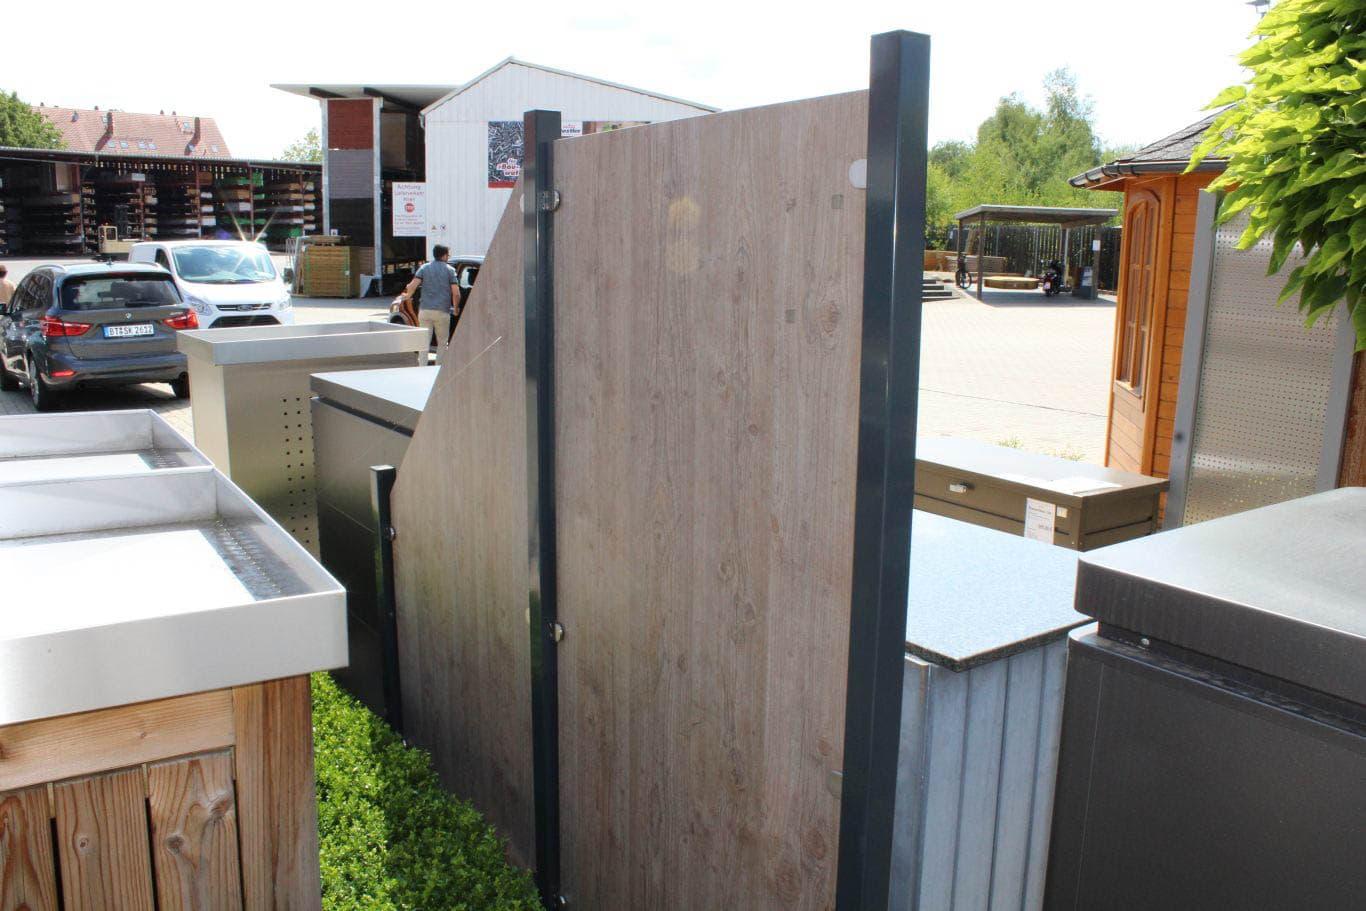 Sichtschutzzaun Groja Holzland Dostler Holz Fur Bau Ausbau